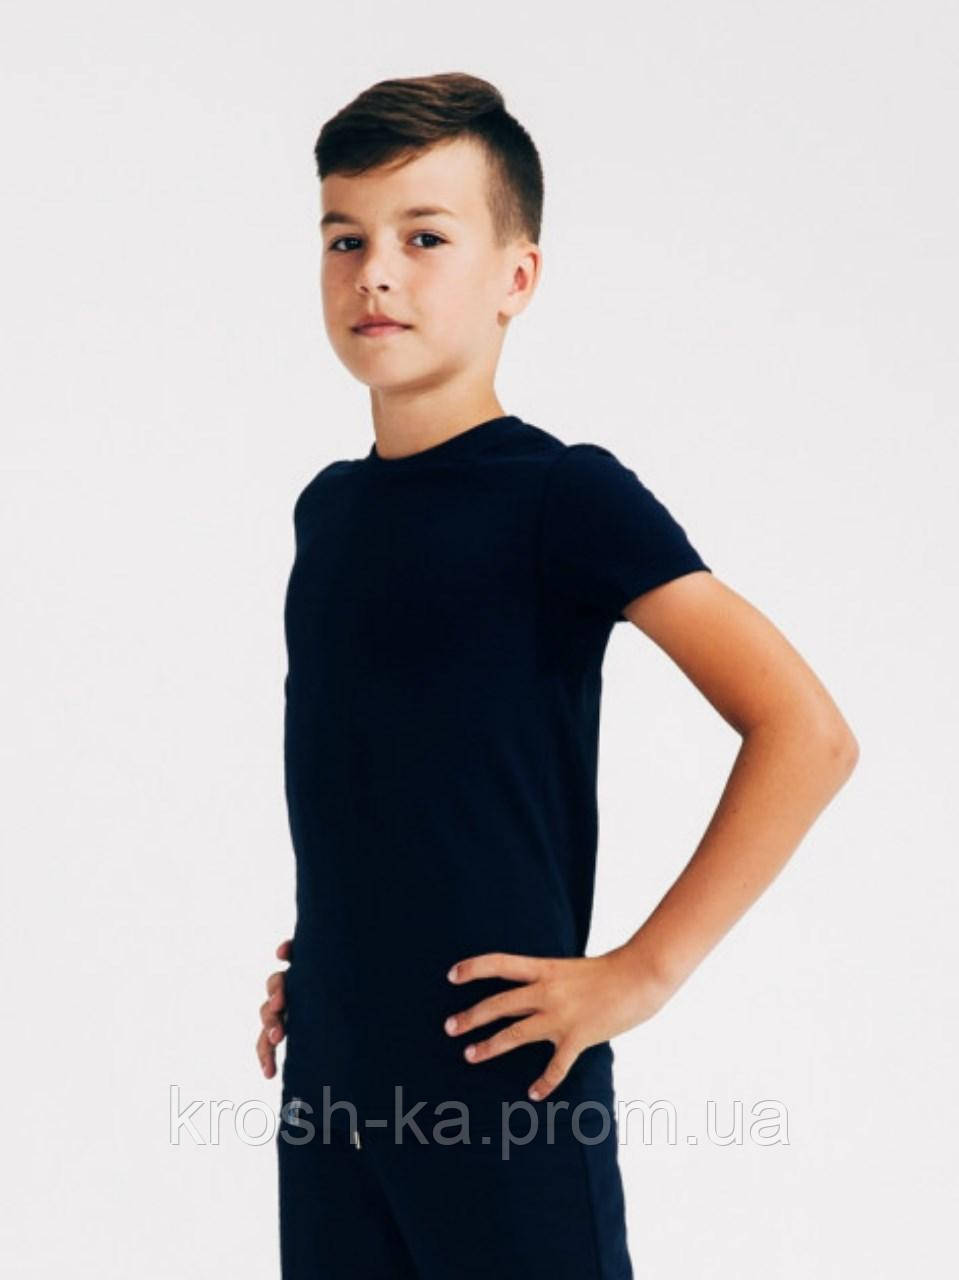 Футболка базовая для мальчика (122,134)р синий Smil(Смил) Украина 110543